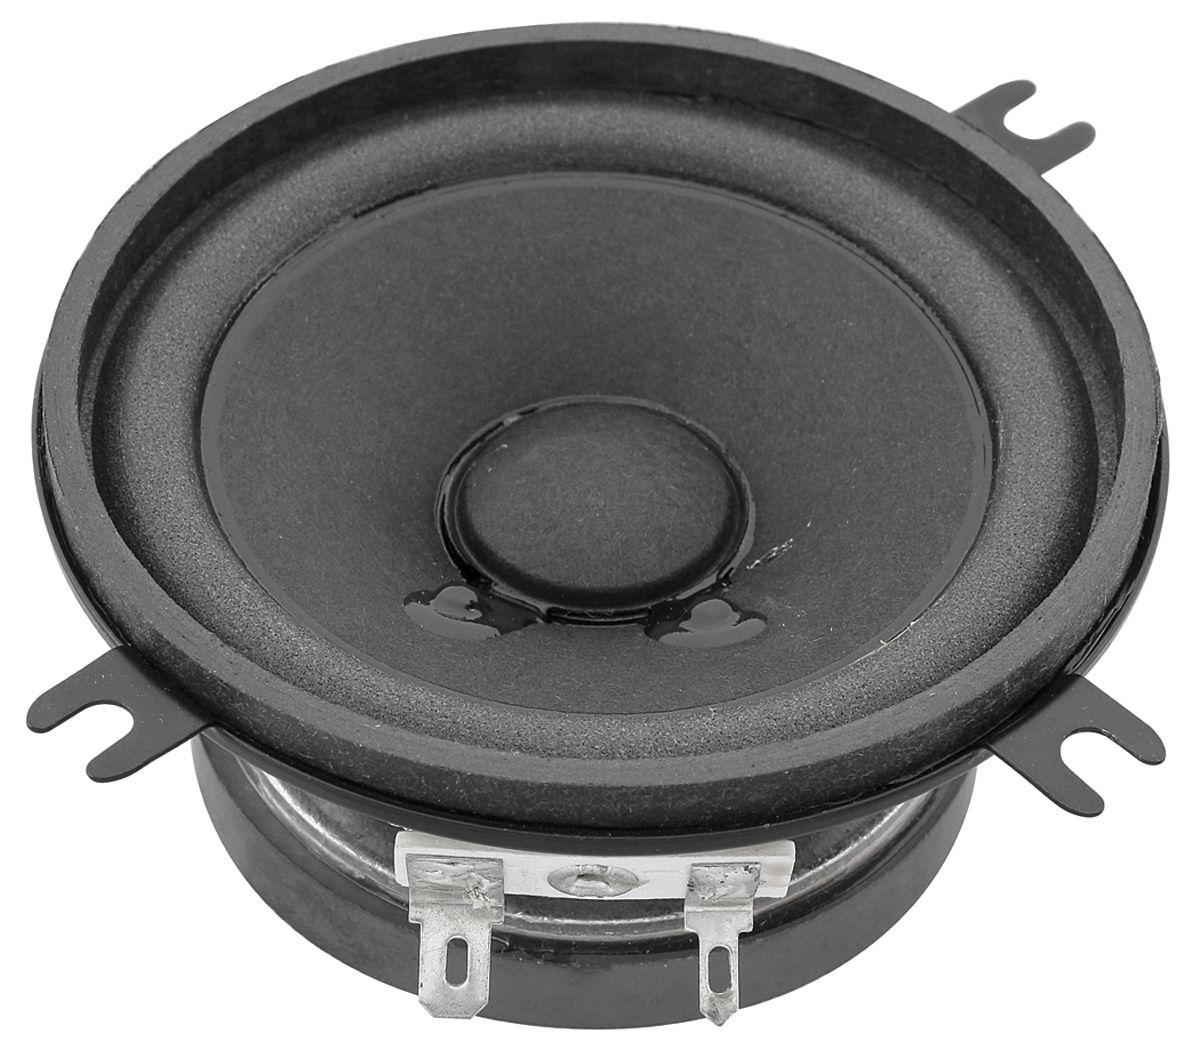 hight resolution of 1978 1988 el camino stereo speaker assembly dash per side